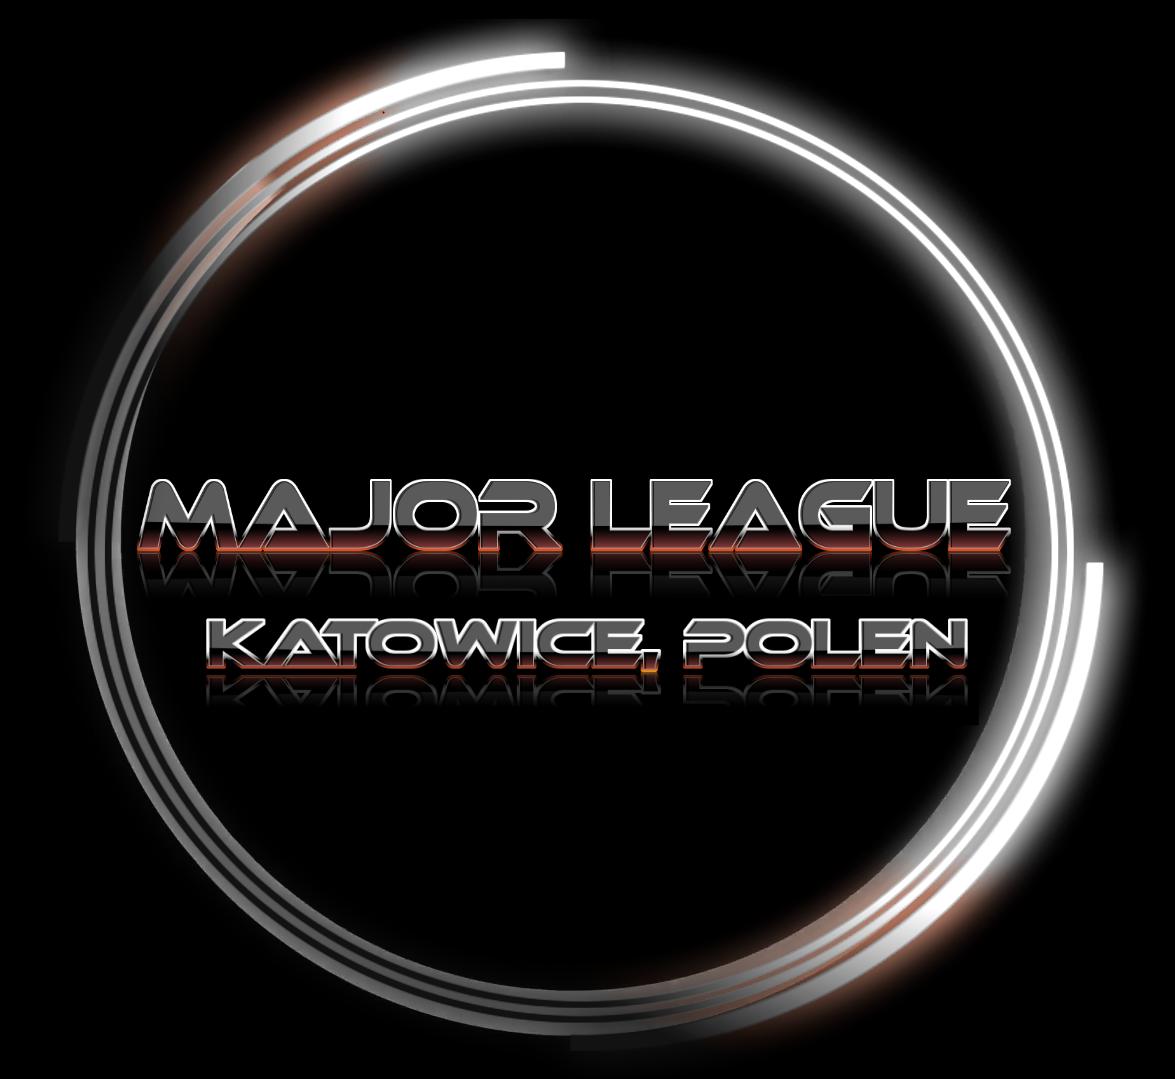 Major League Katowice, Polen anmälan (3 platser kvar!!)